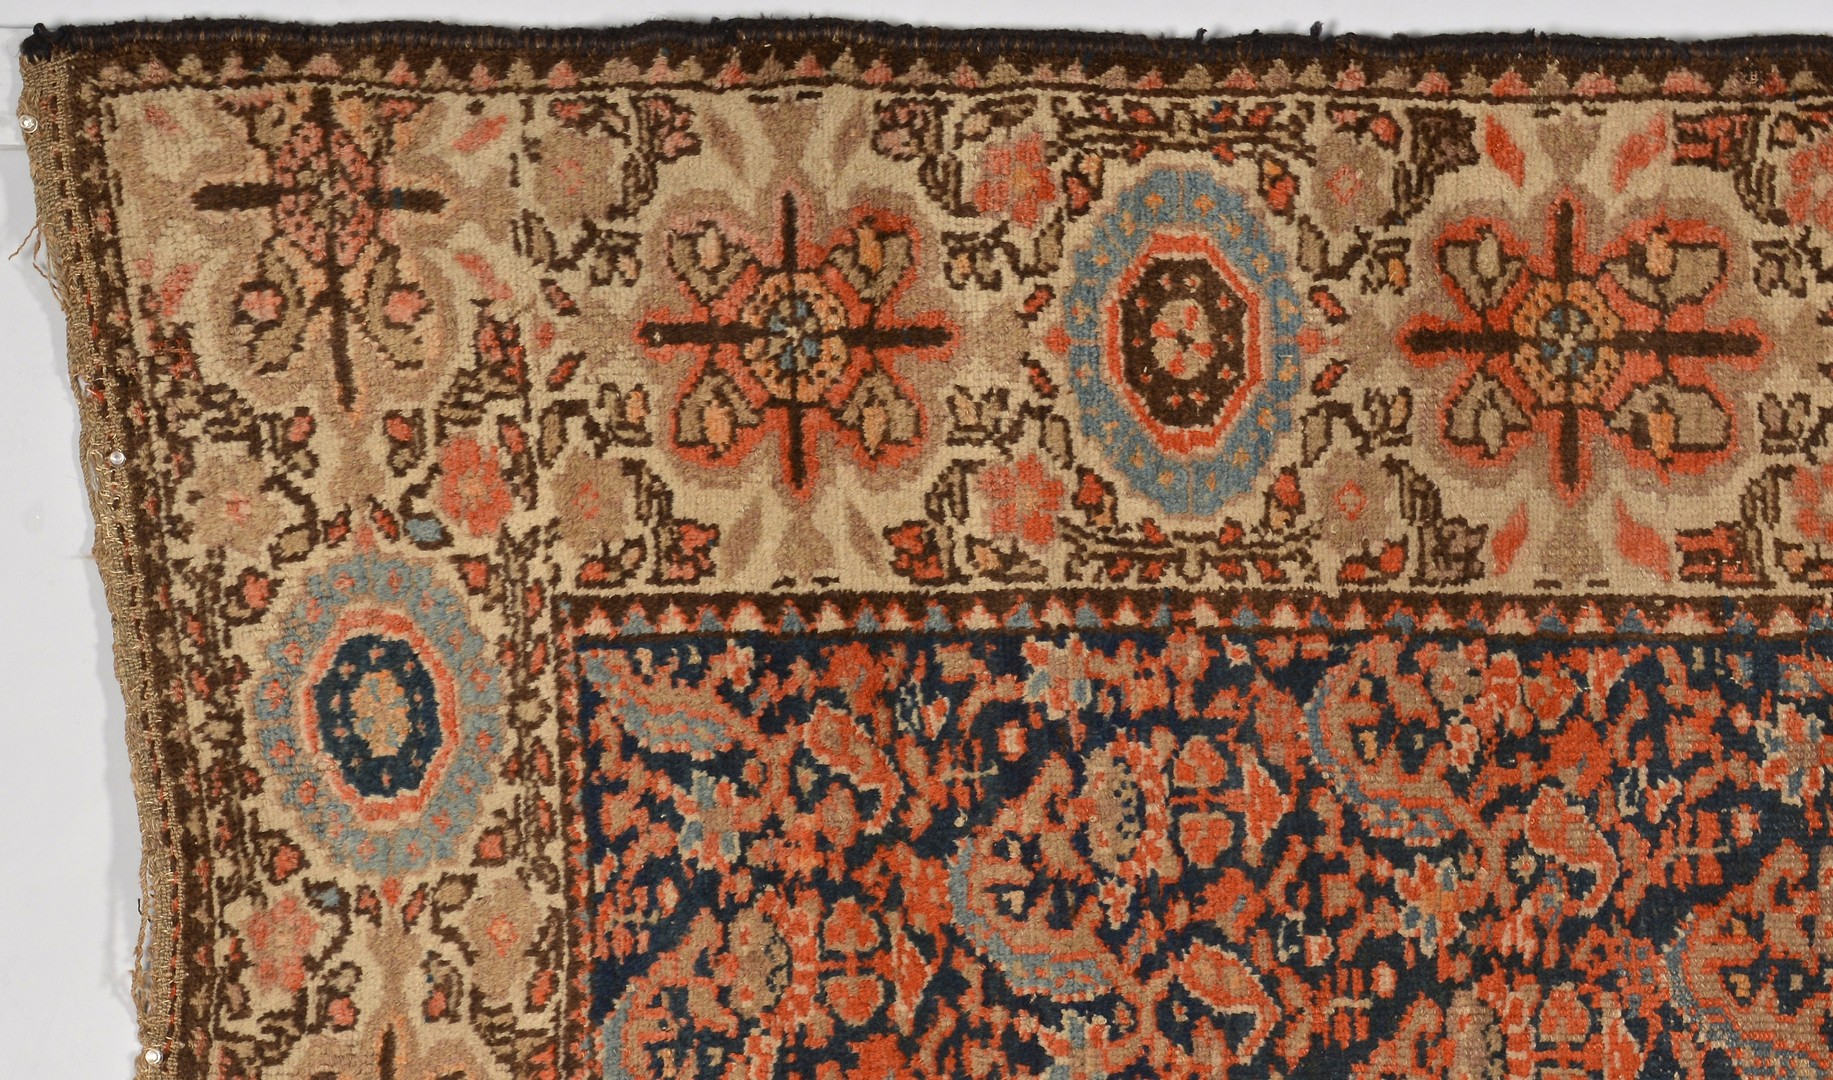 Lot 917: Kurdish area rug, early 20th century